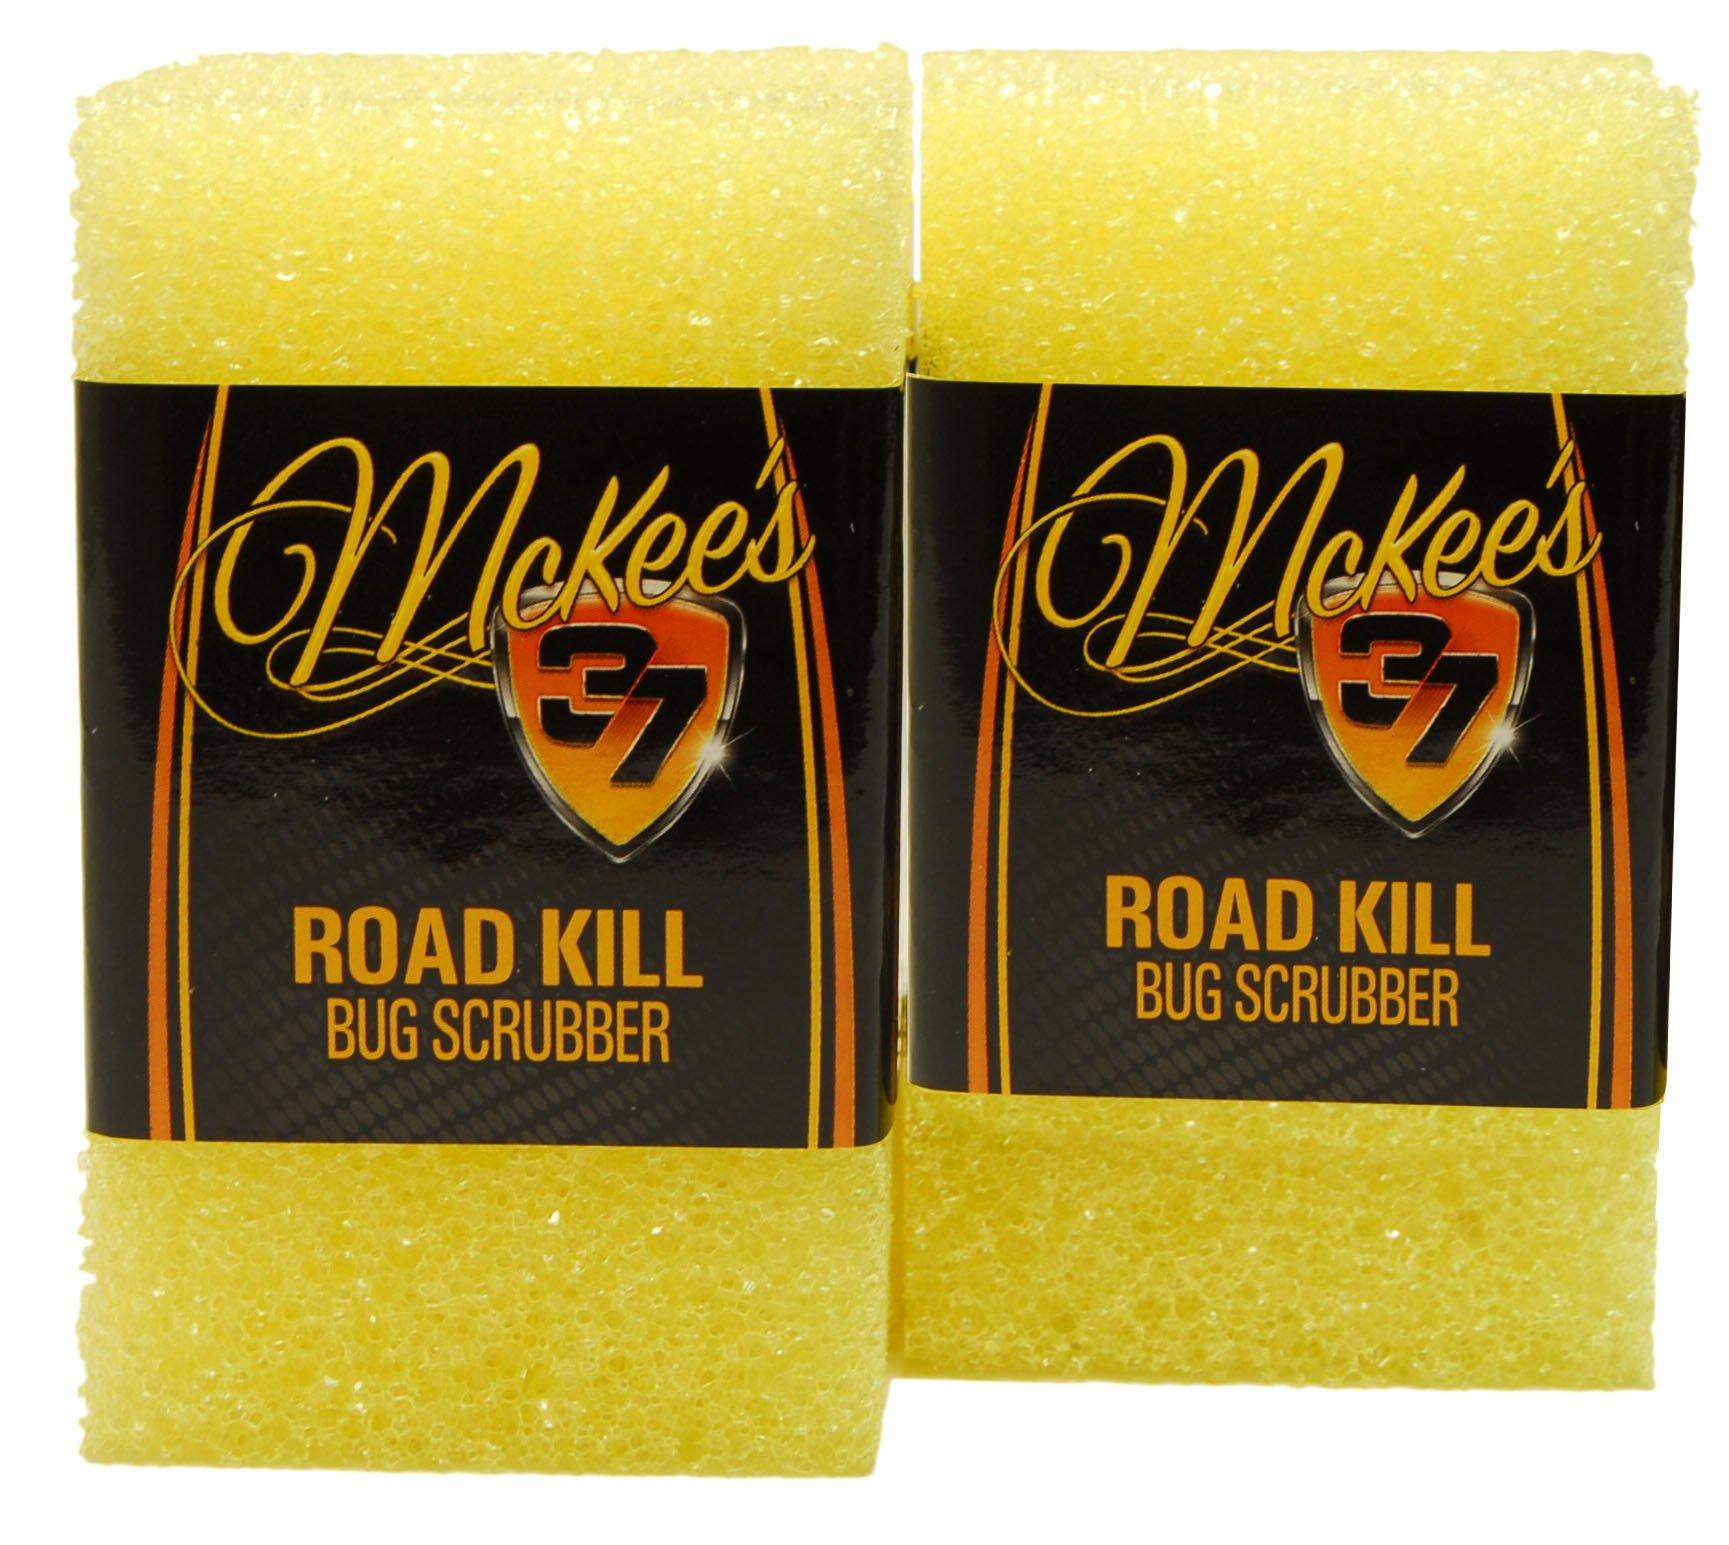 McKees 37 Road Scrubber 2 Pack